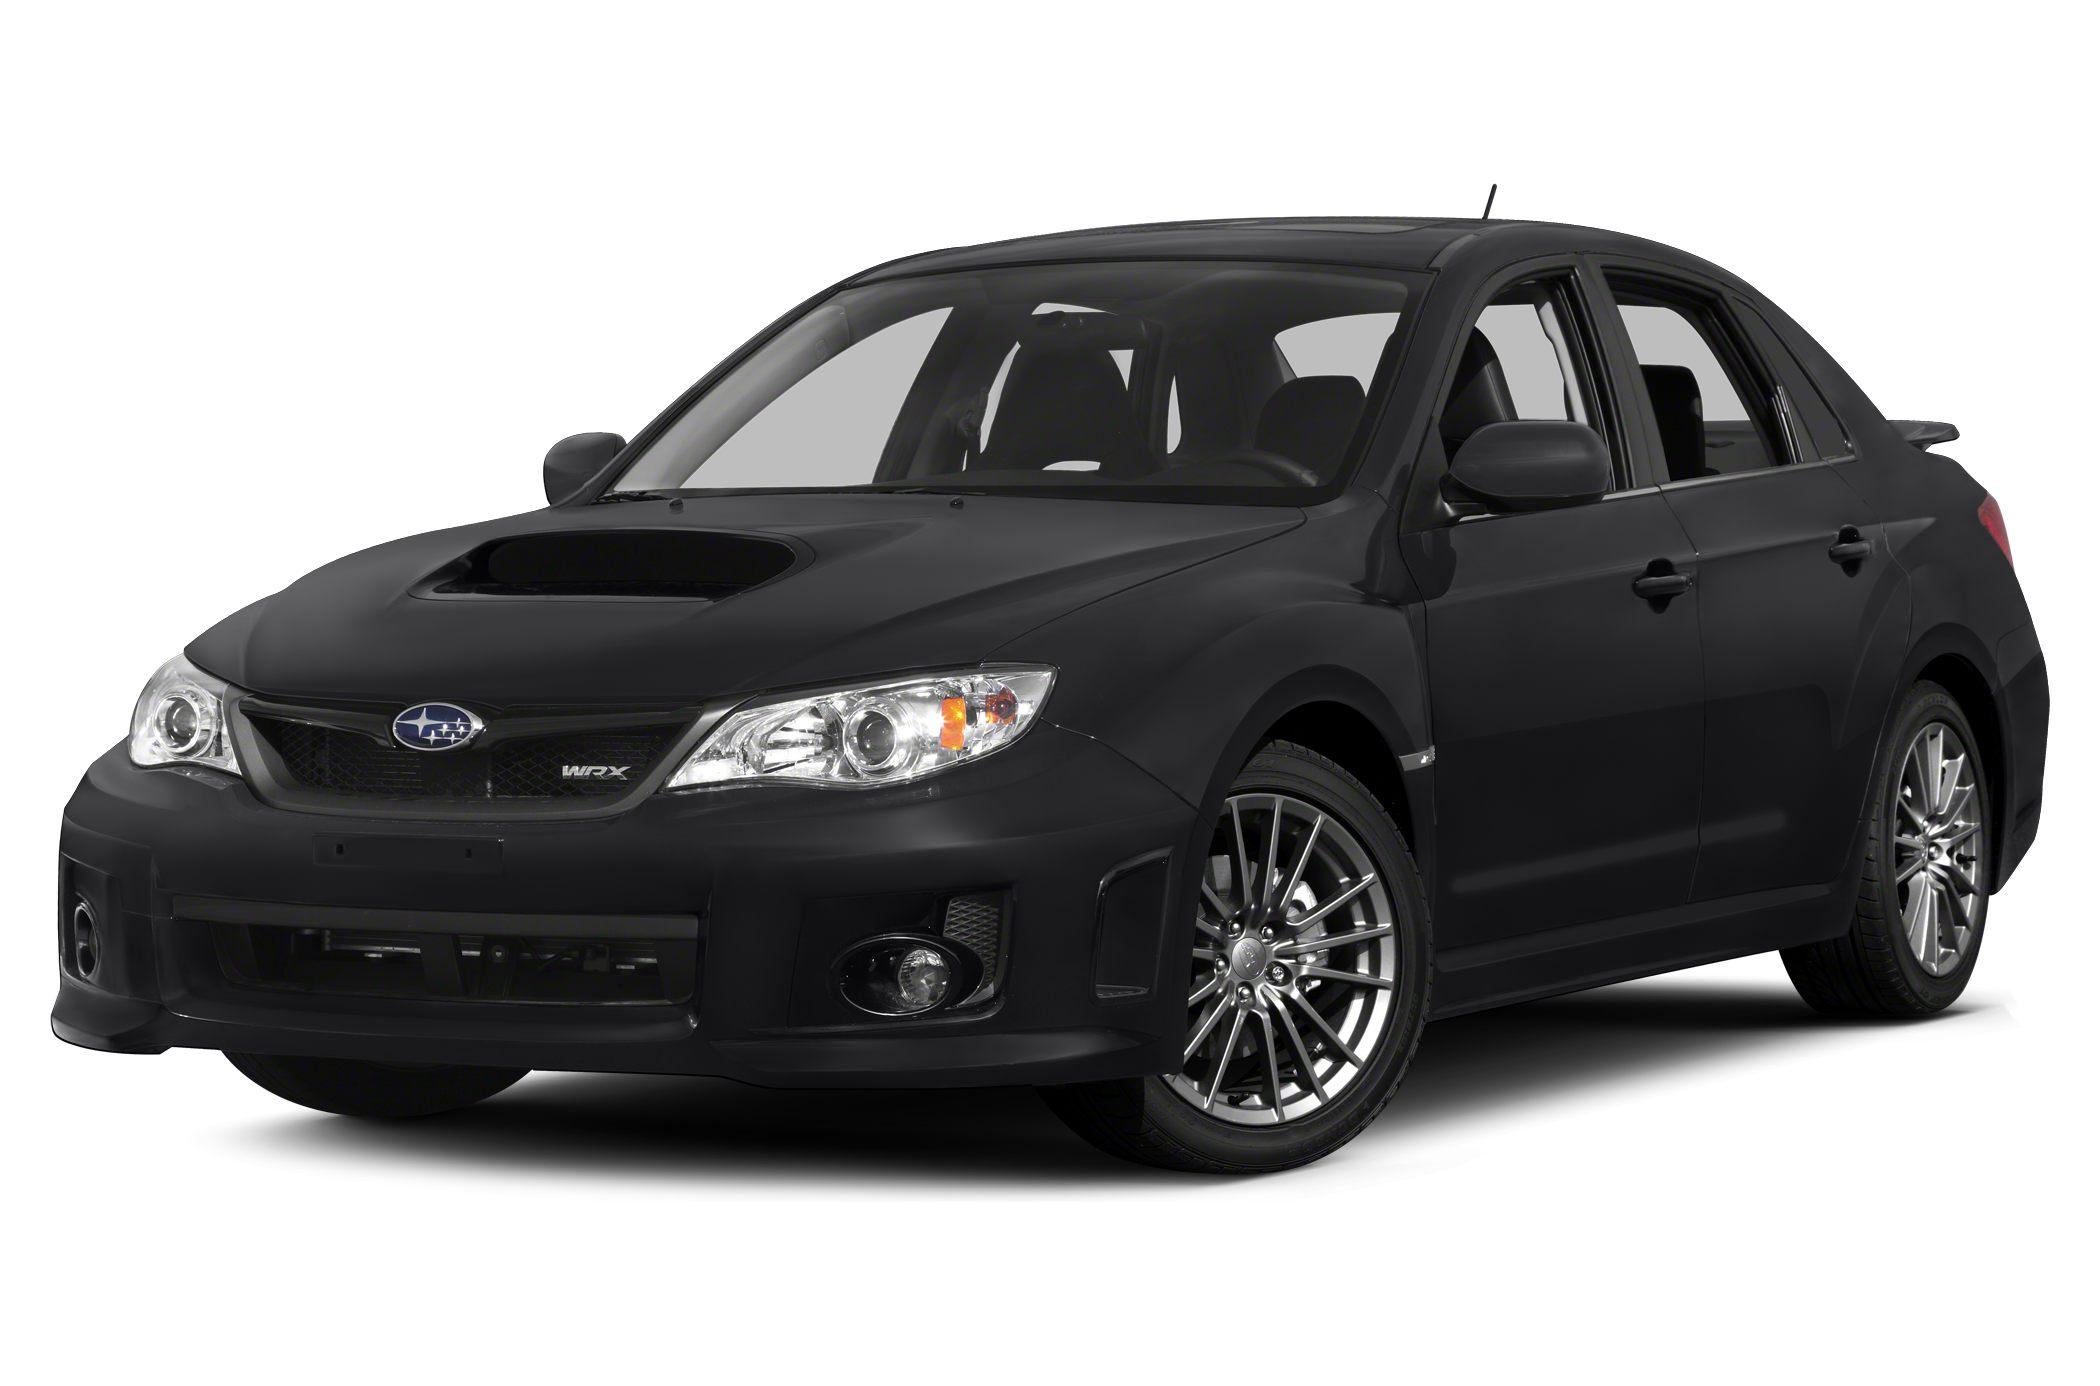 2014 Subaru Impreza WRX Limited Hatchback for sale in Spokane for $26,991 with 21,944 miles.